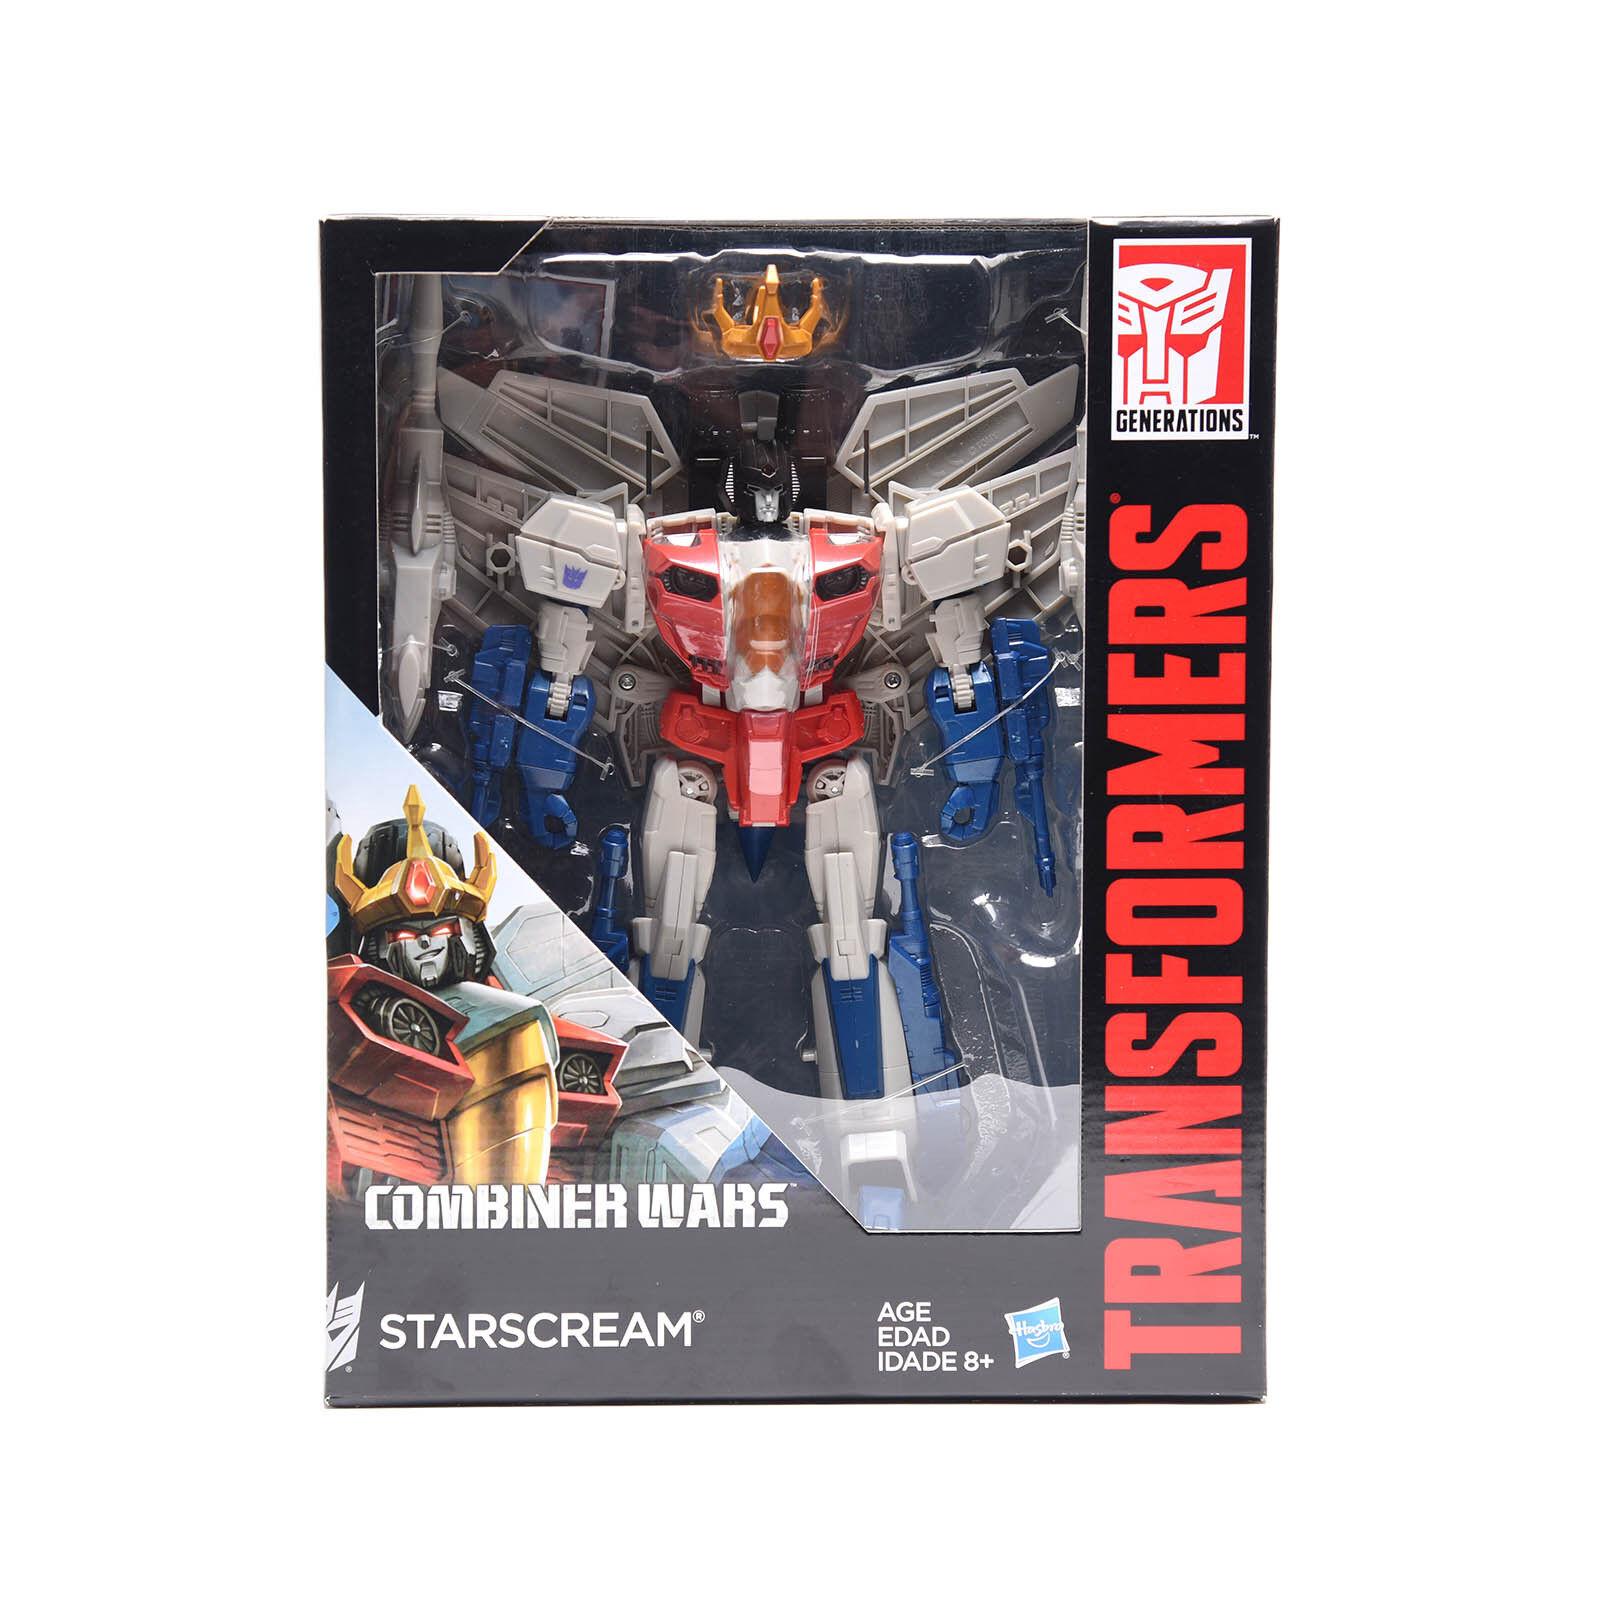 NEW ARRIVAL Transformers Combiner Wars Leader Starscream